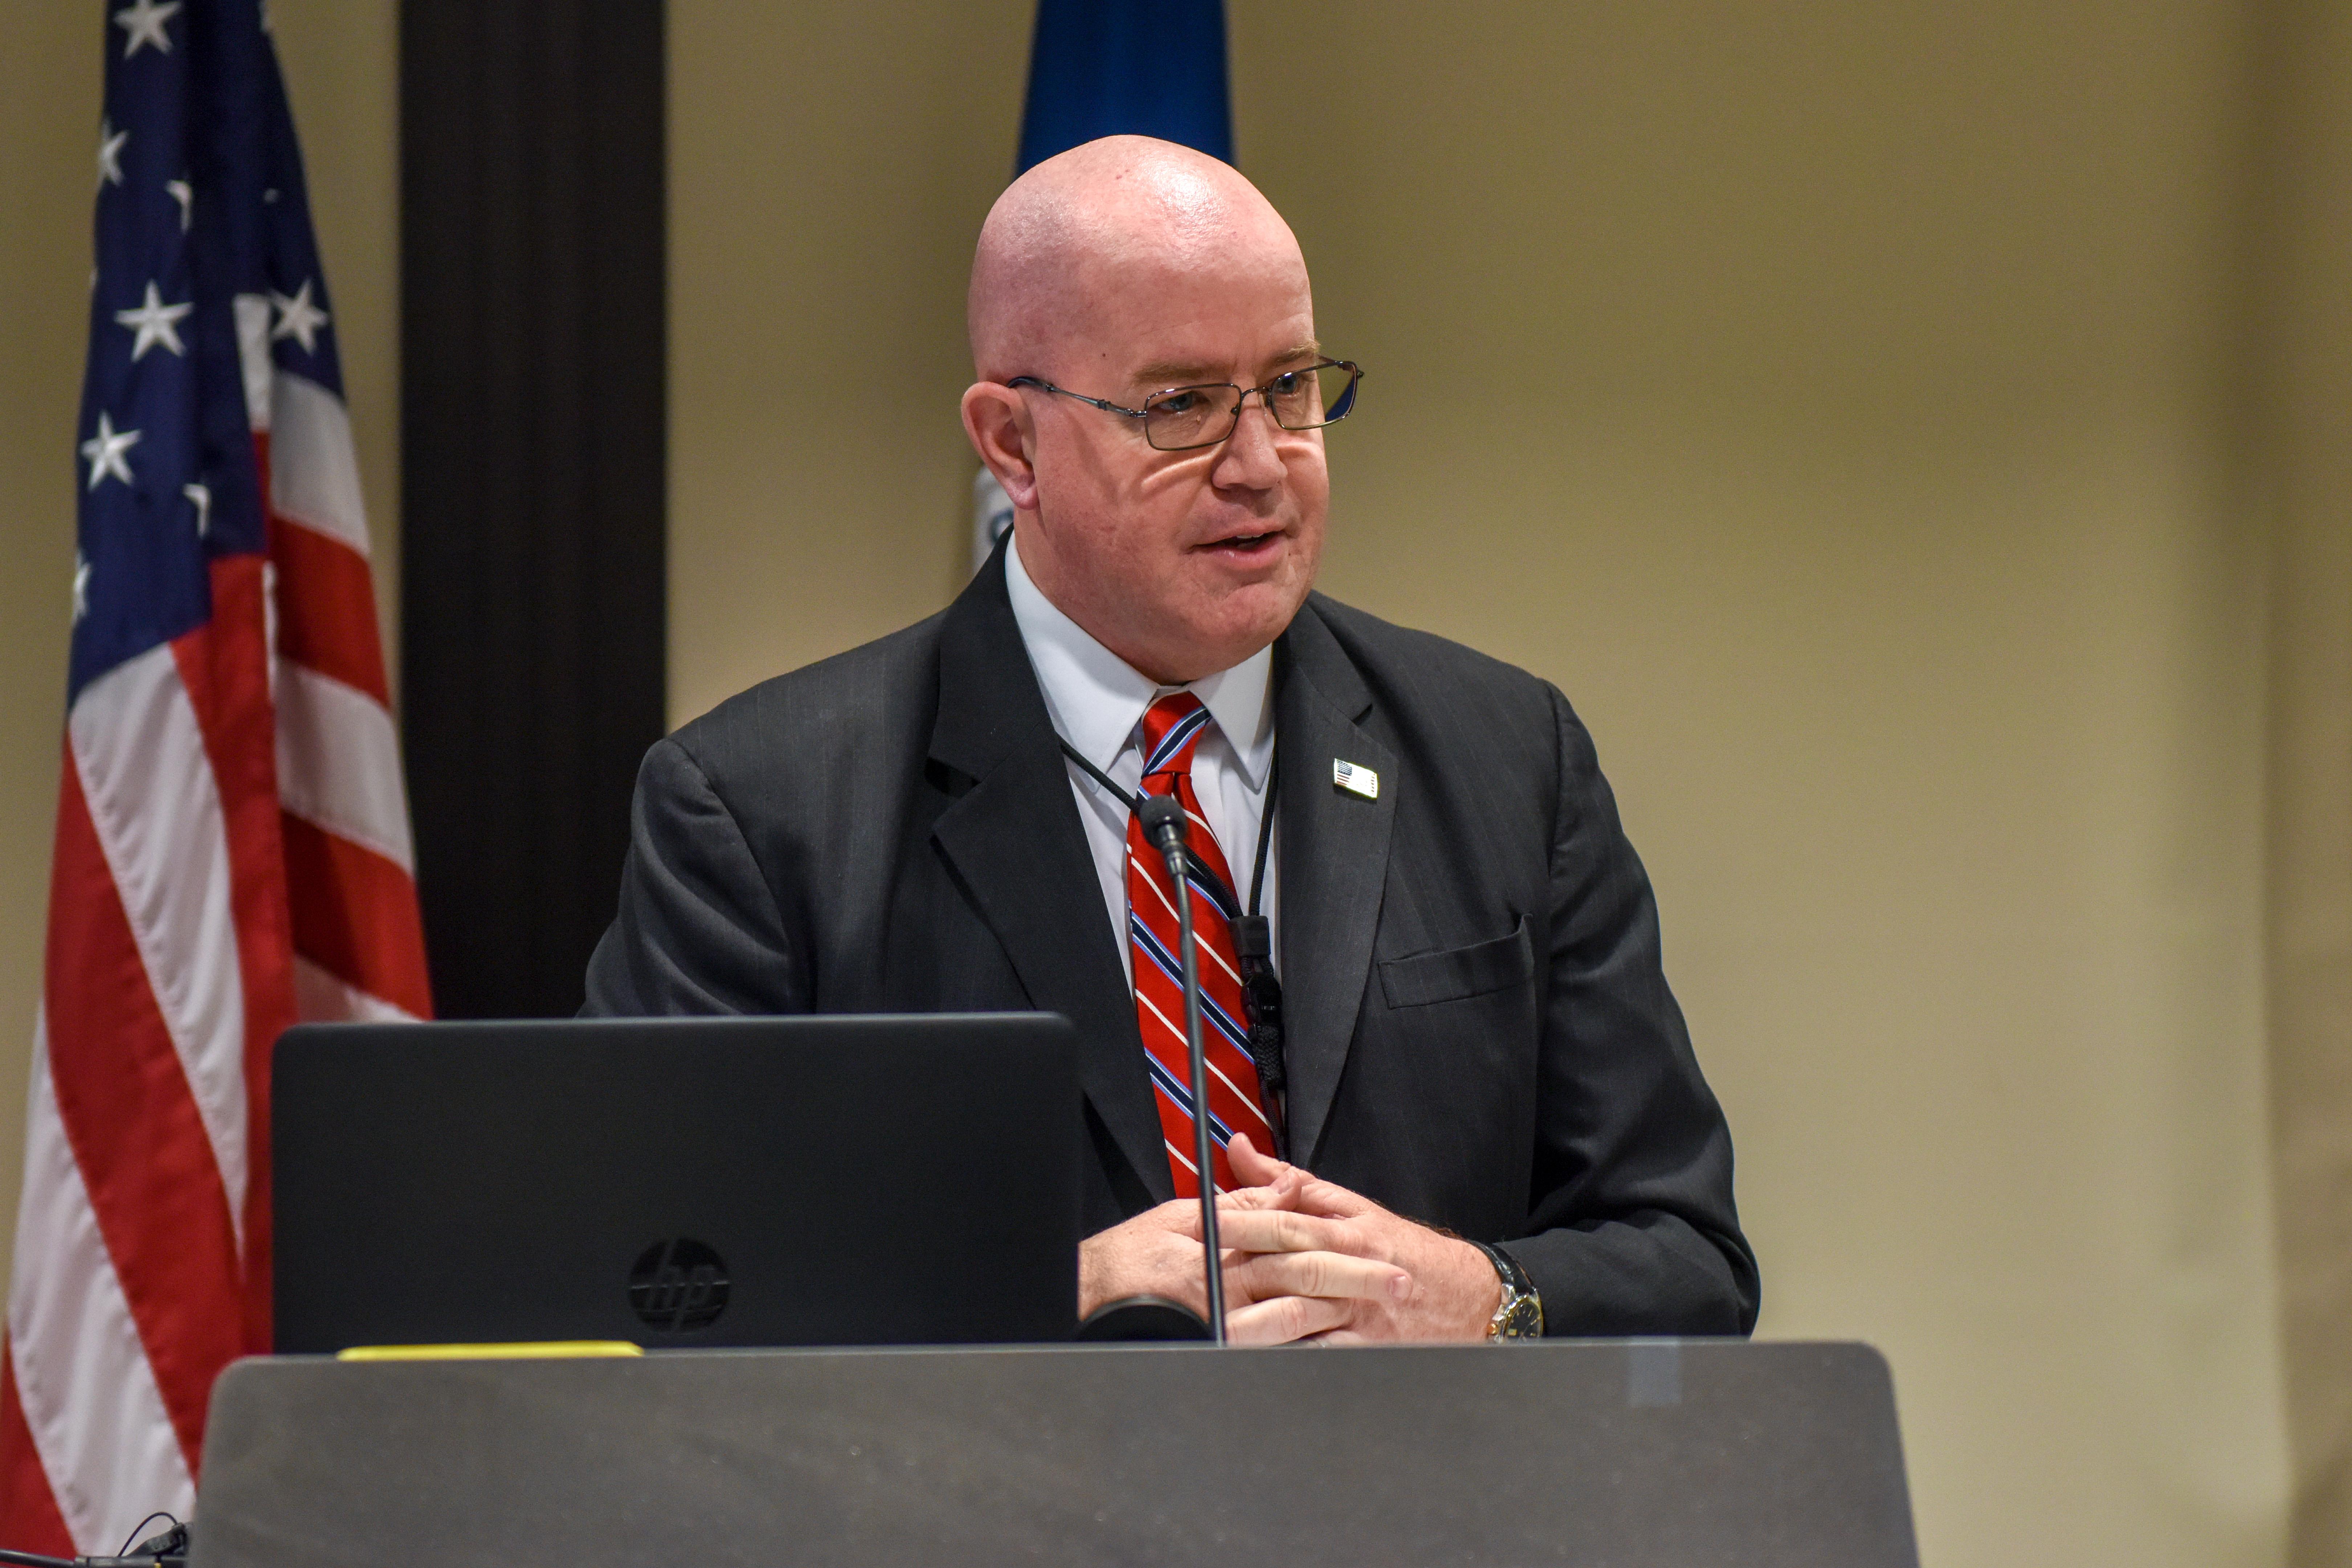 IPR Center Deputy Director, William Ross